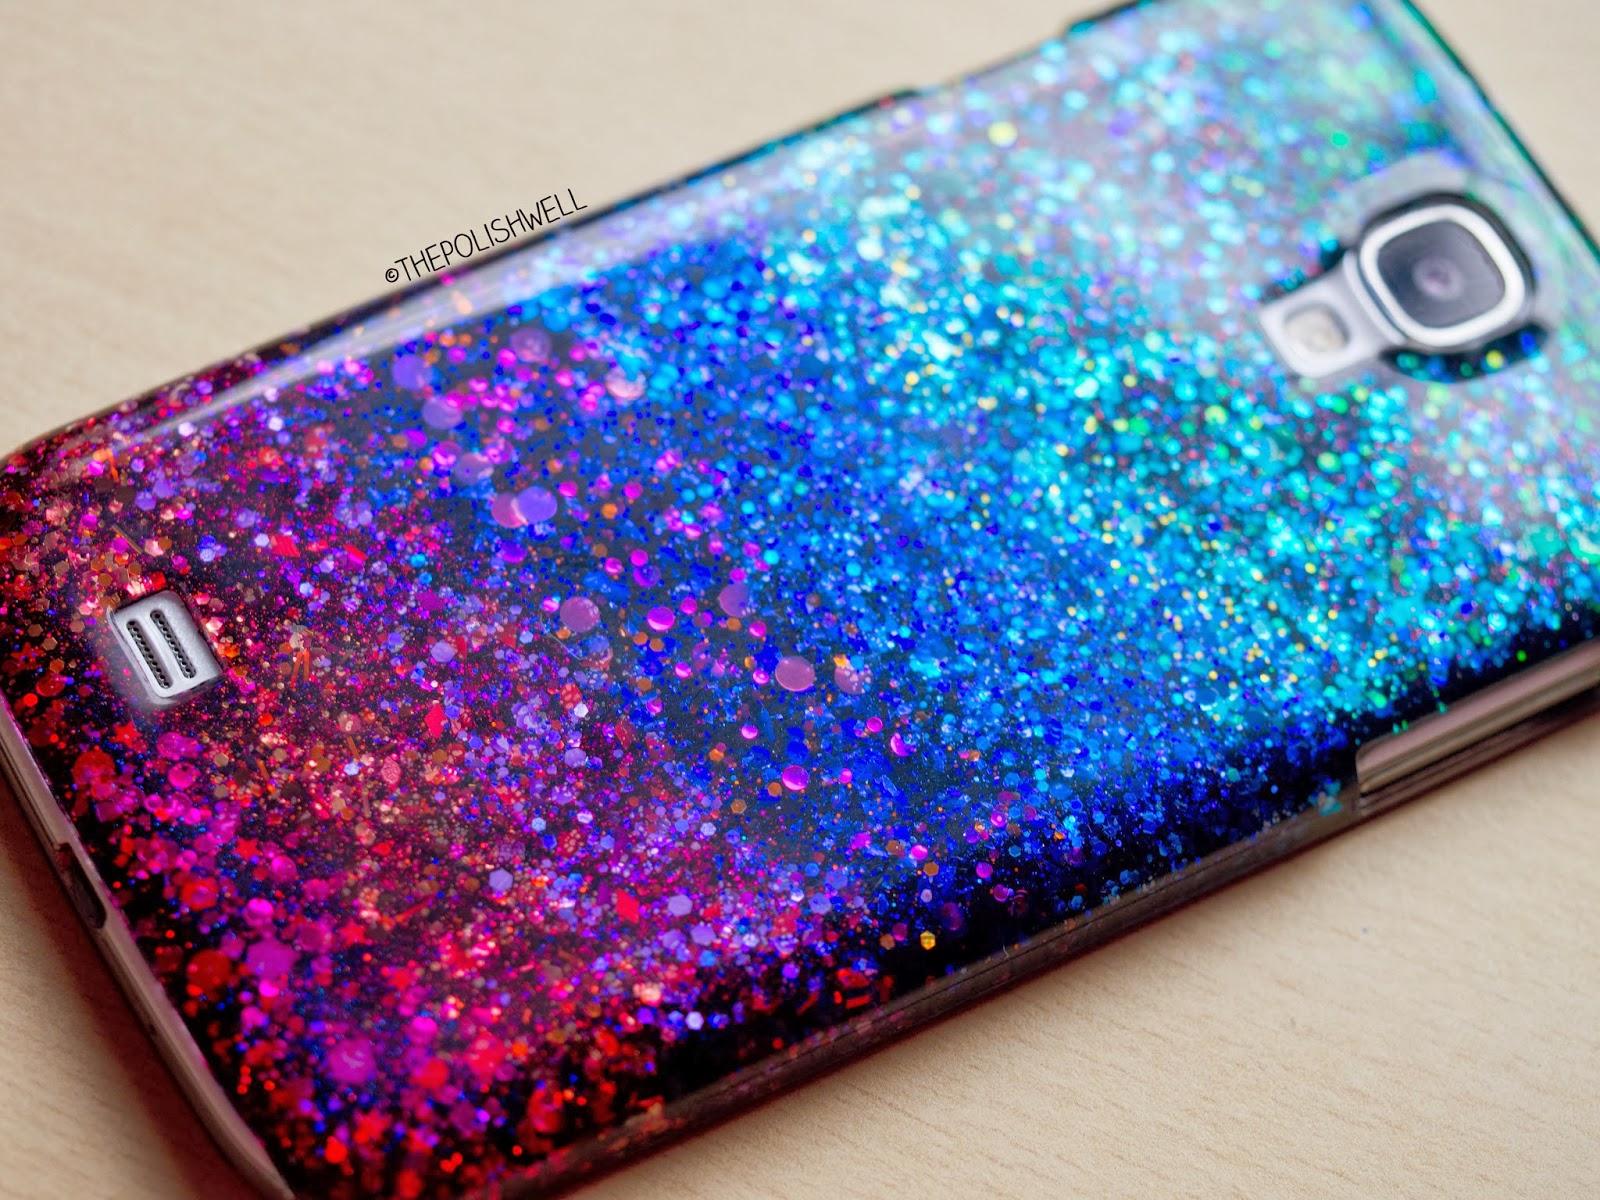 The polish well diy glitter phone cover - Como decorar una funda de movil transparente ...